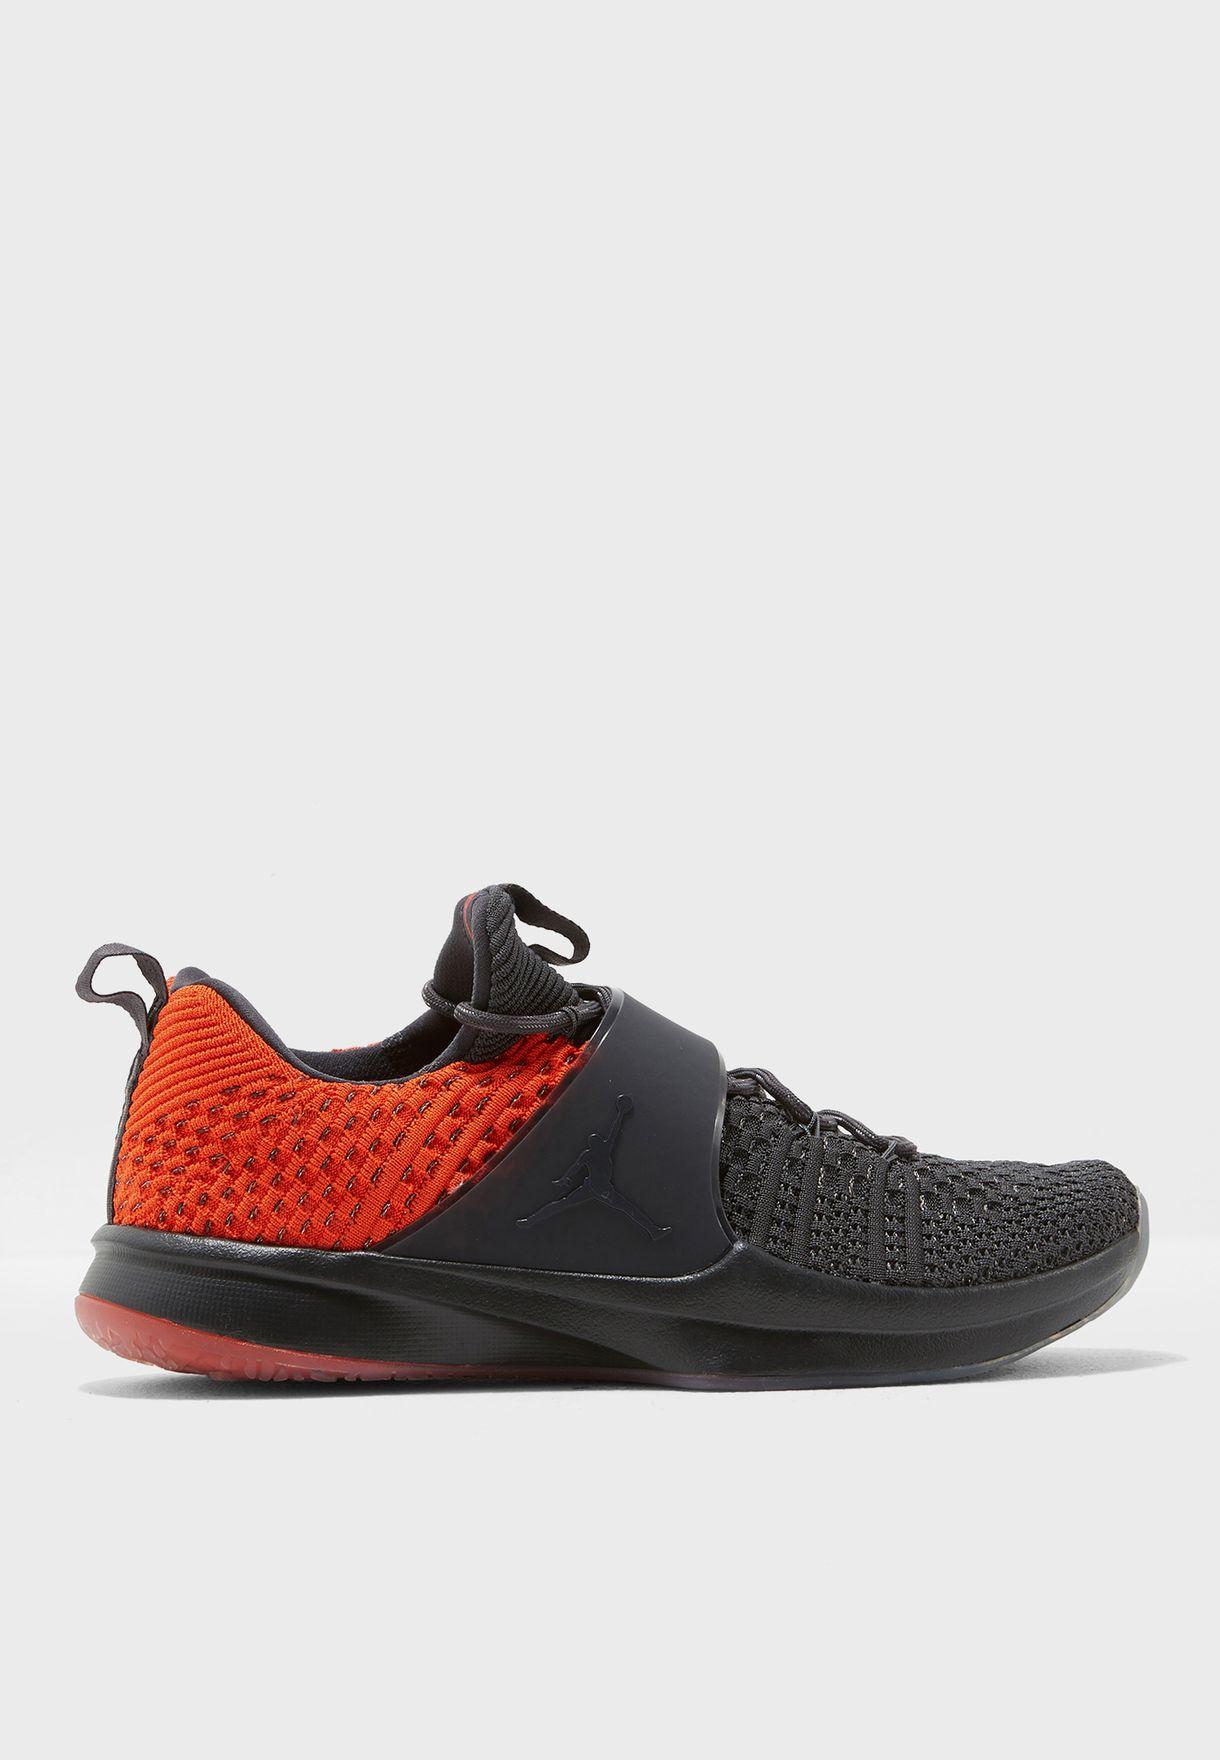 outlet store c1551 3fedf Shop Nike multicolor Jordan Trainer 2 Flyknit 921210-012 for Men in ...